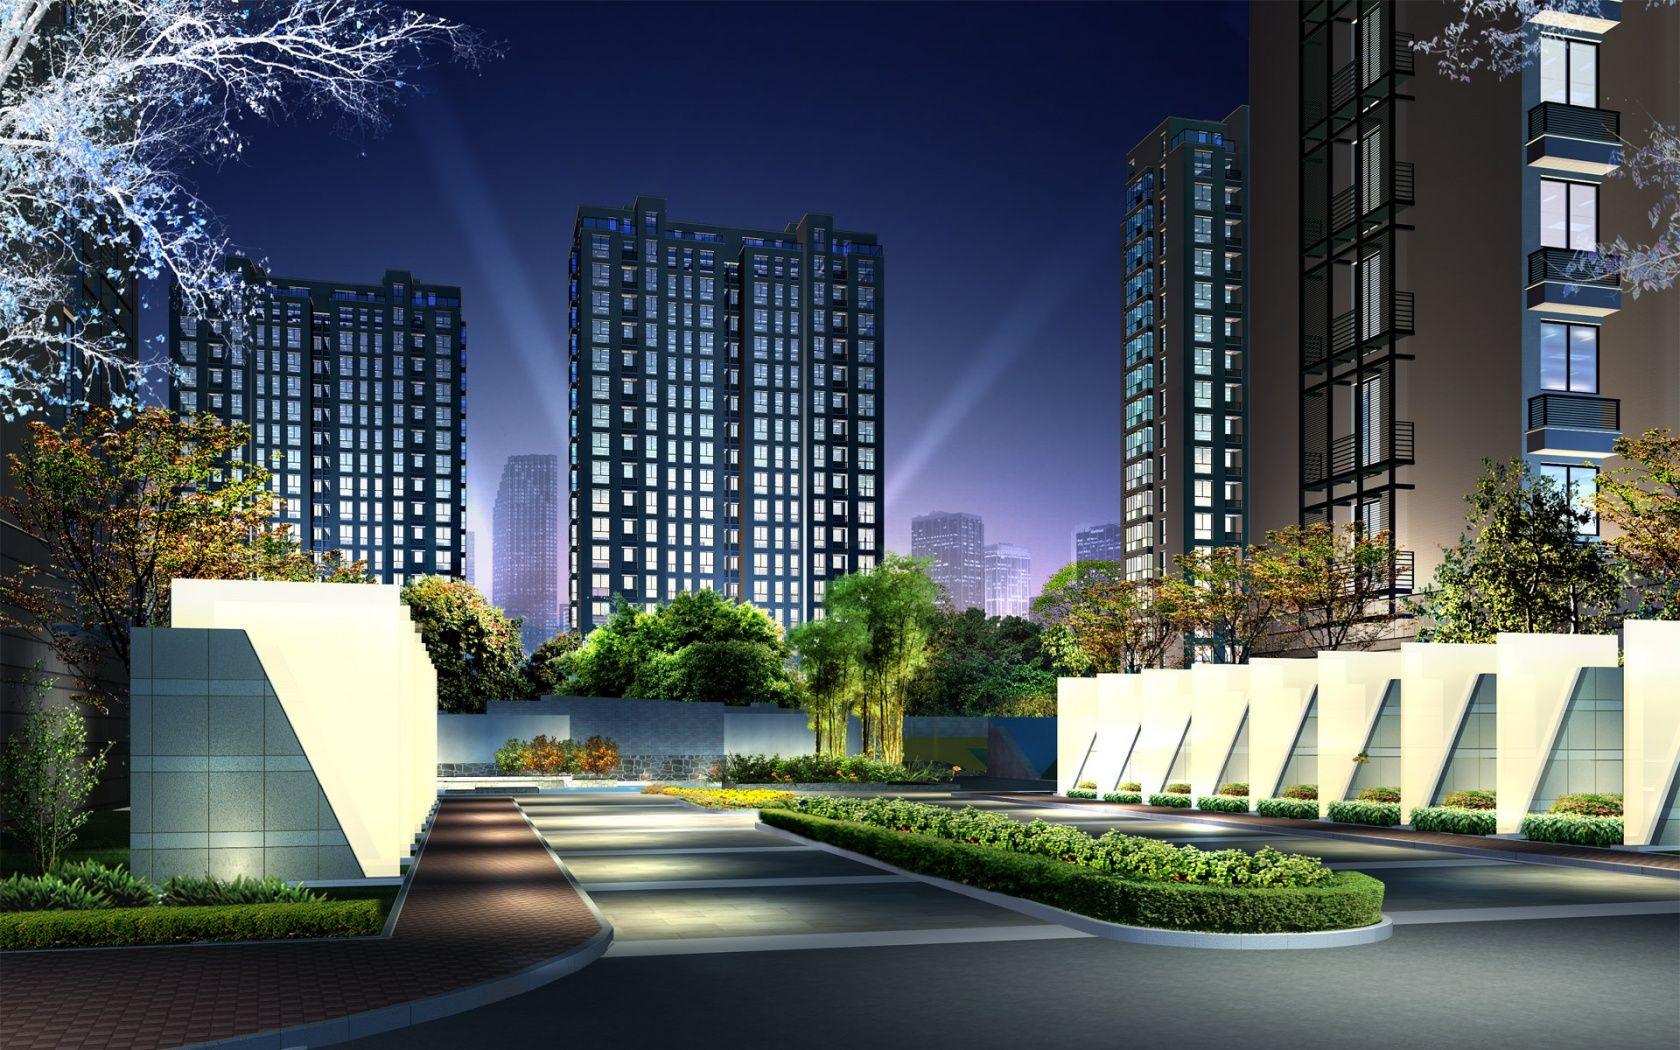 luxury_apartments-1680x1050.jpg (1680×1050)